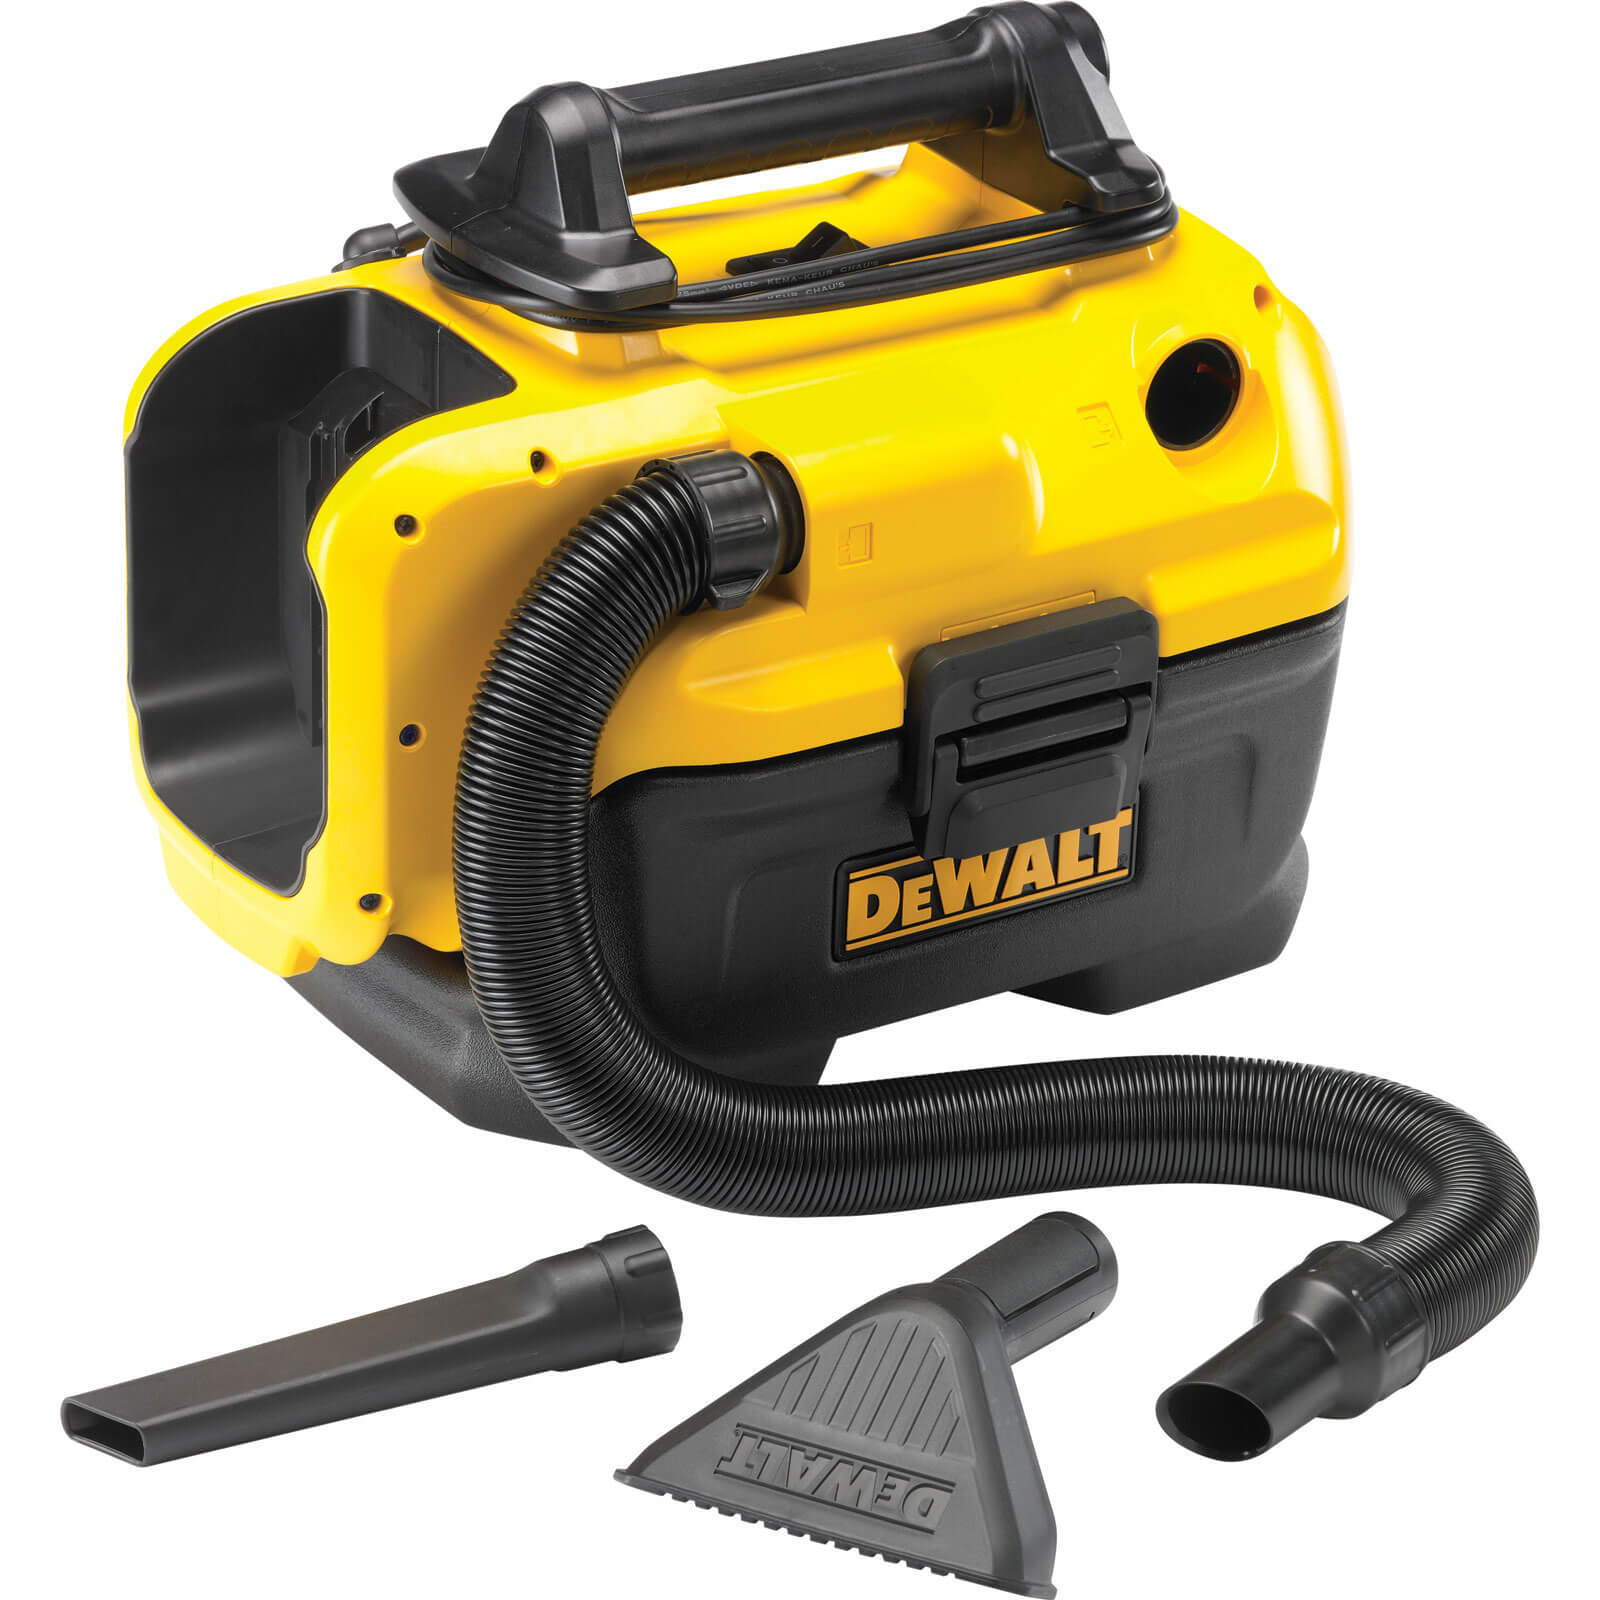 Image of DeWalt DCV582 18v / 240v Cordless & Electric XR Wet & Dry Vacuum Cleaner without Batteries or Charger